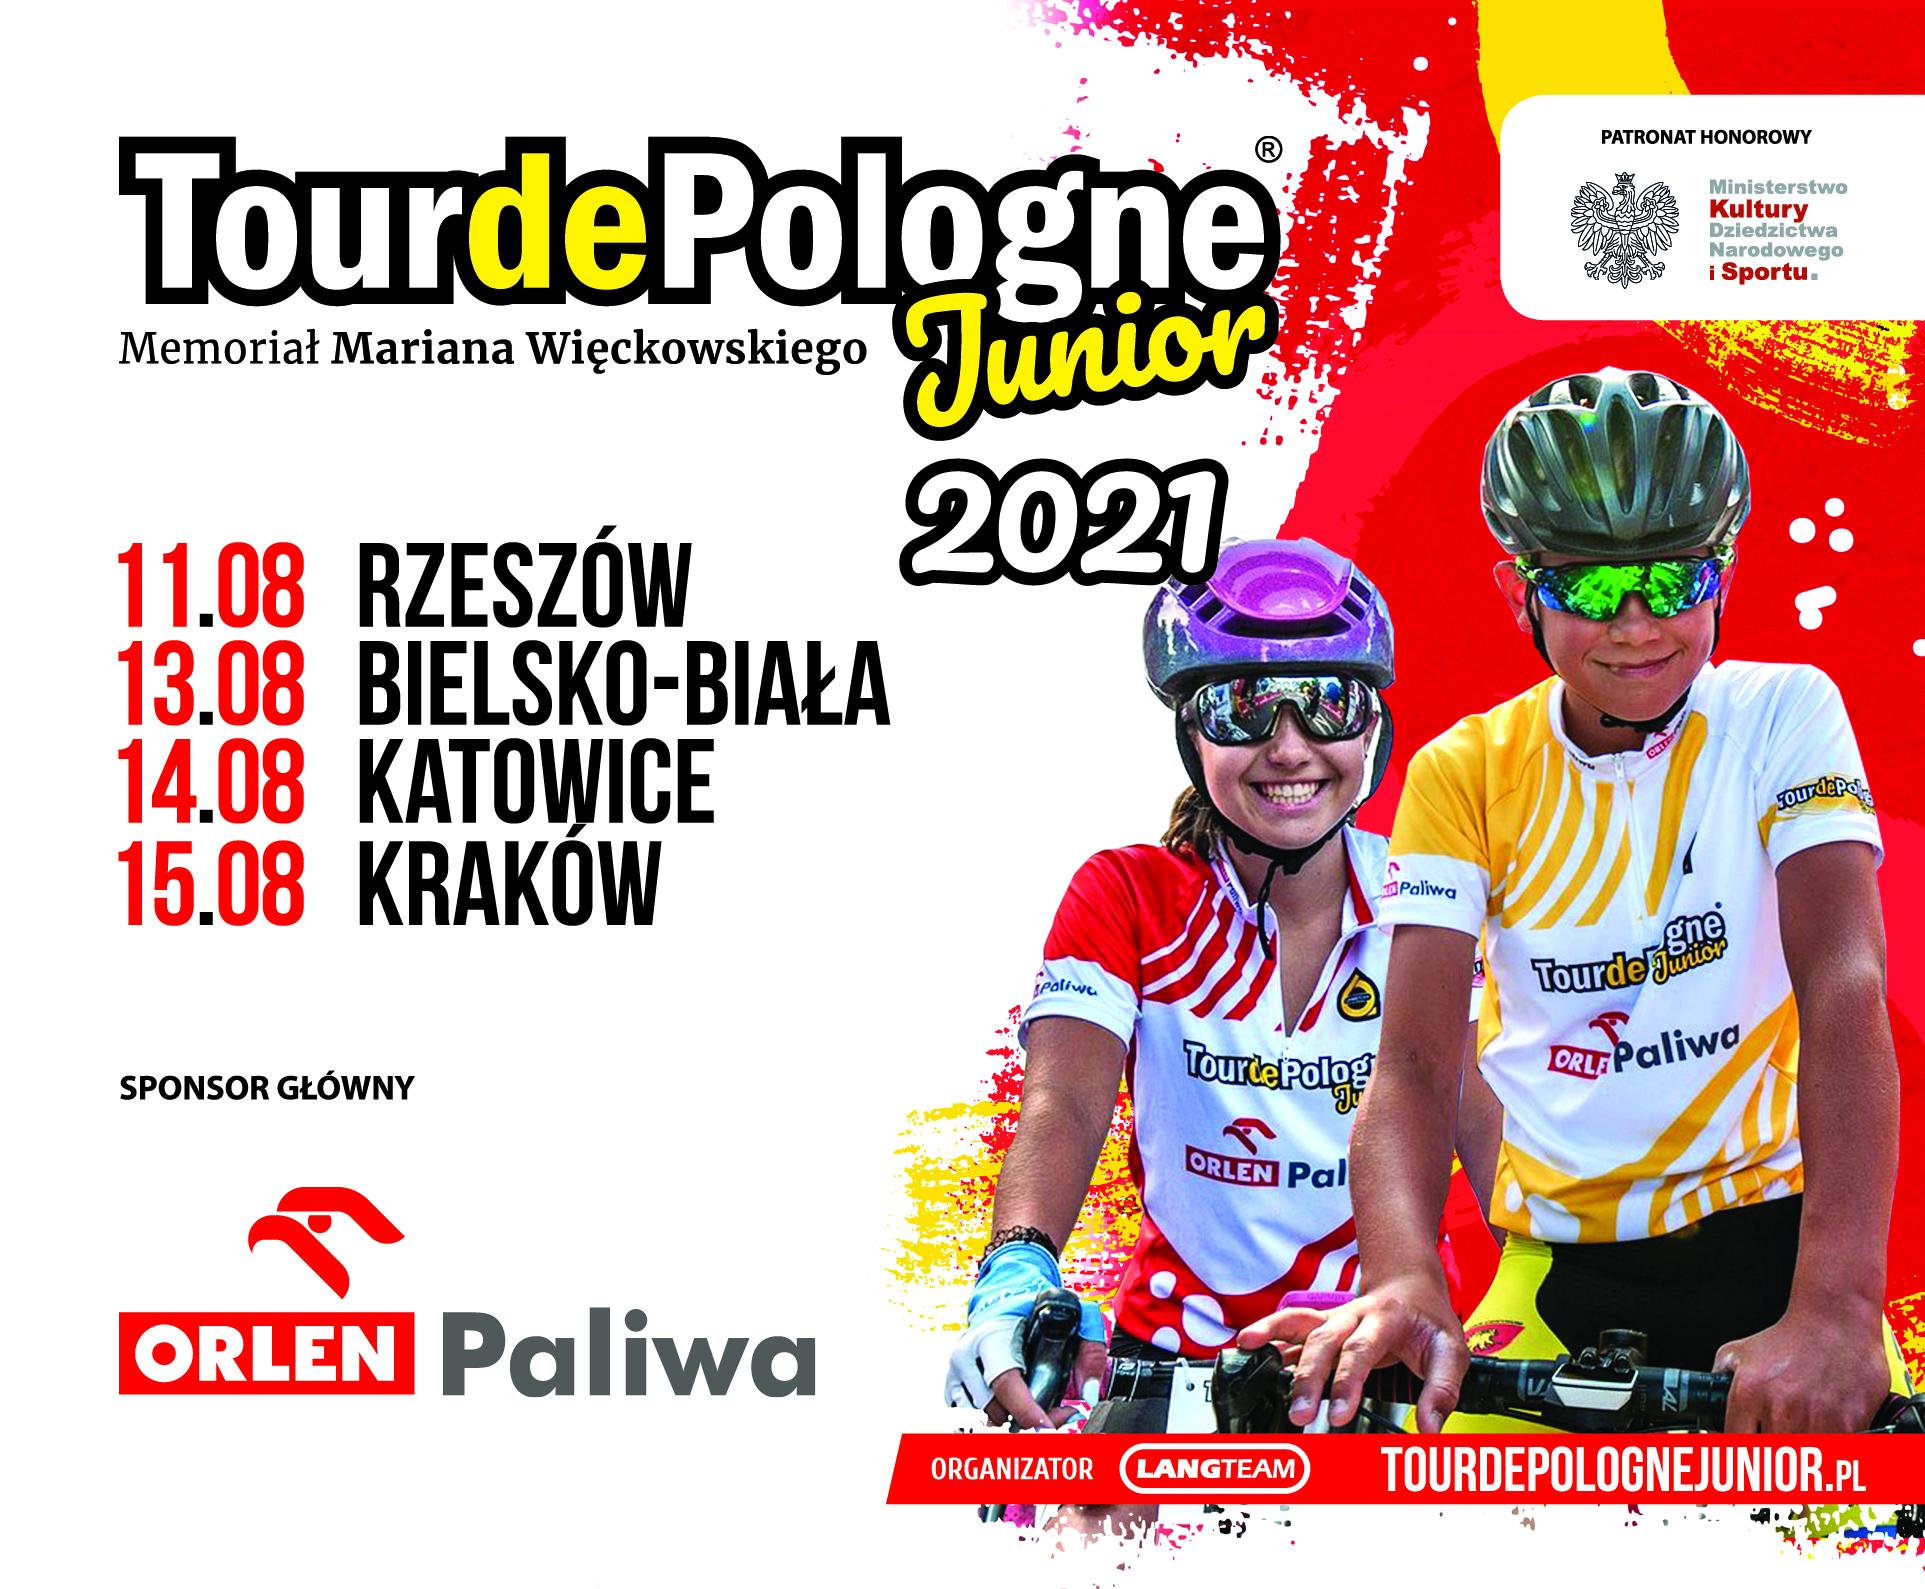 Tourdepologne Junior